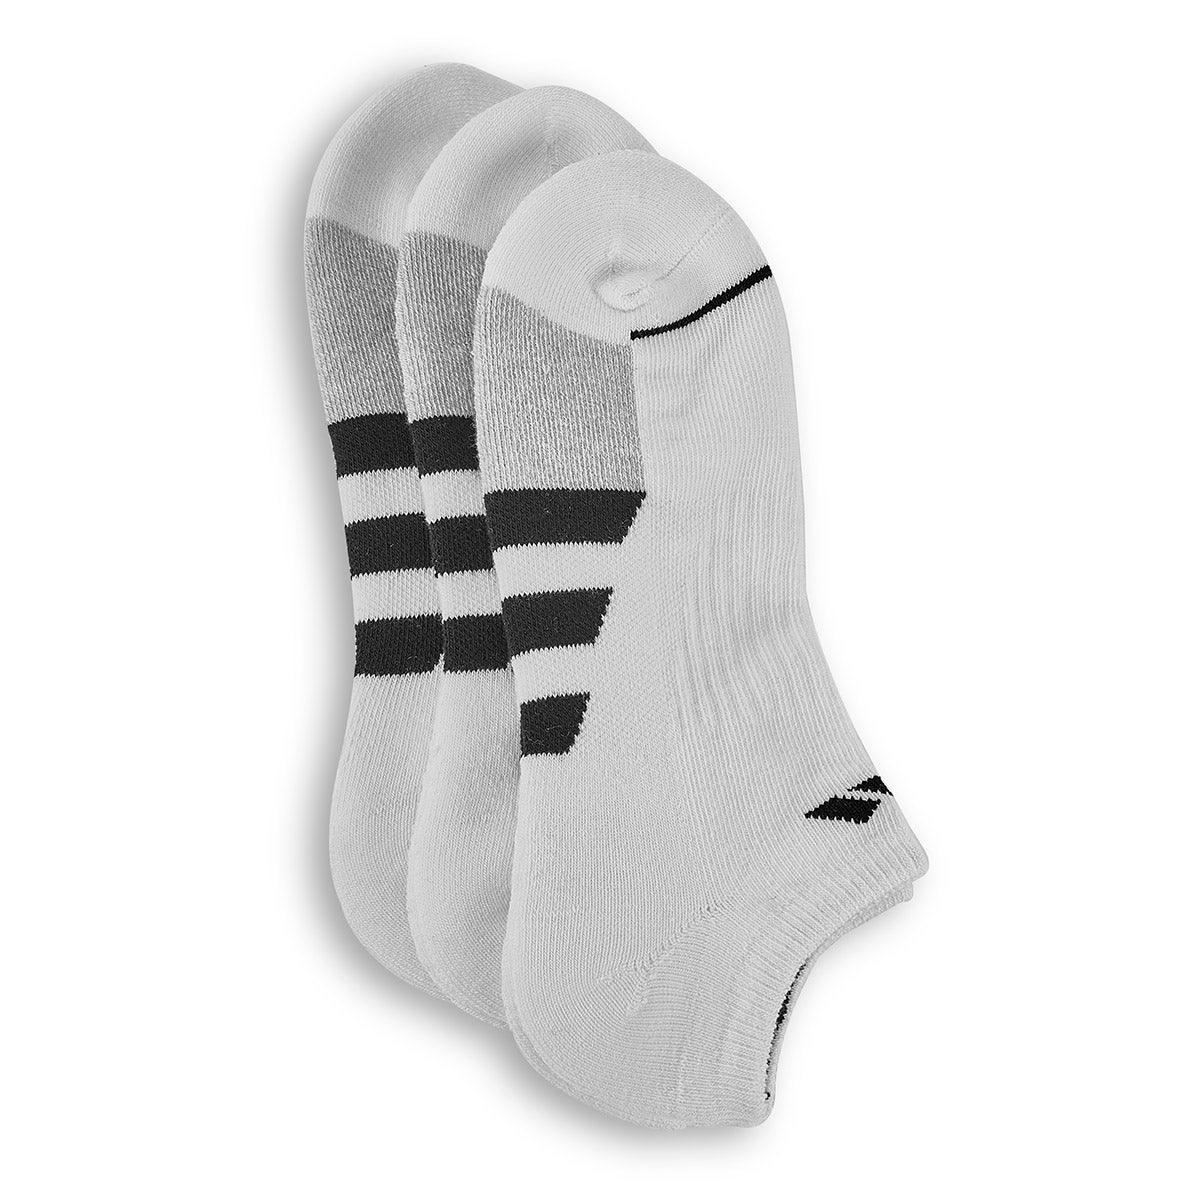 Men's CUSHIONED II white low cut socks - 3pk